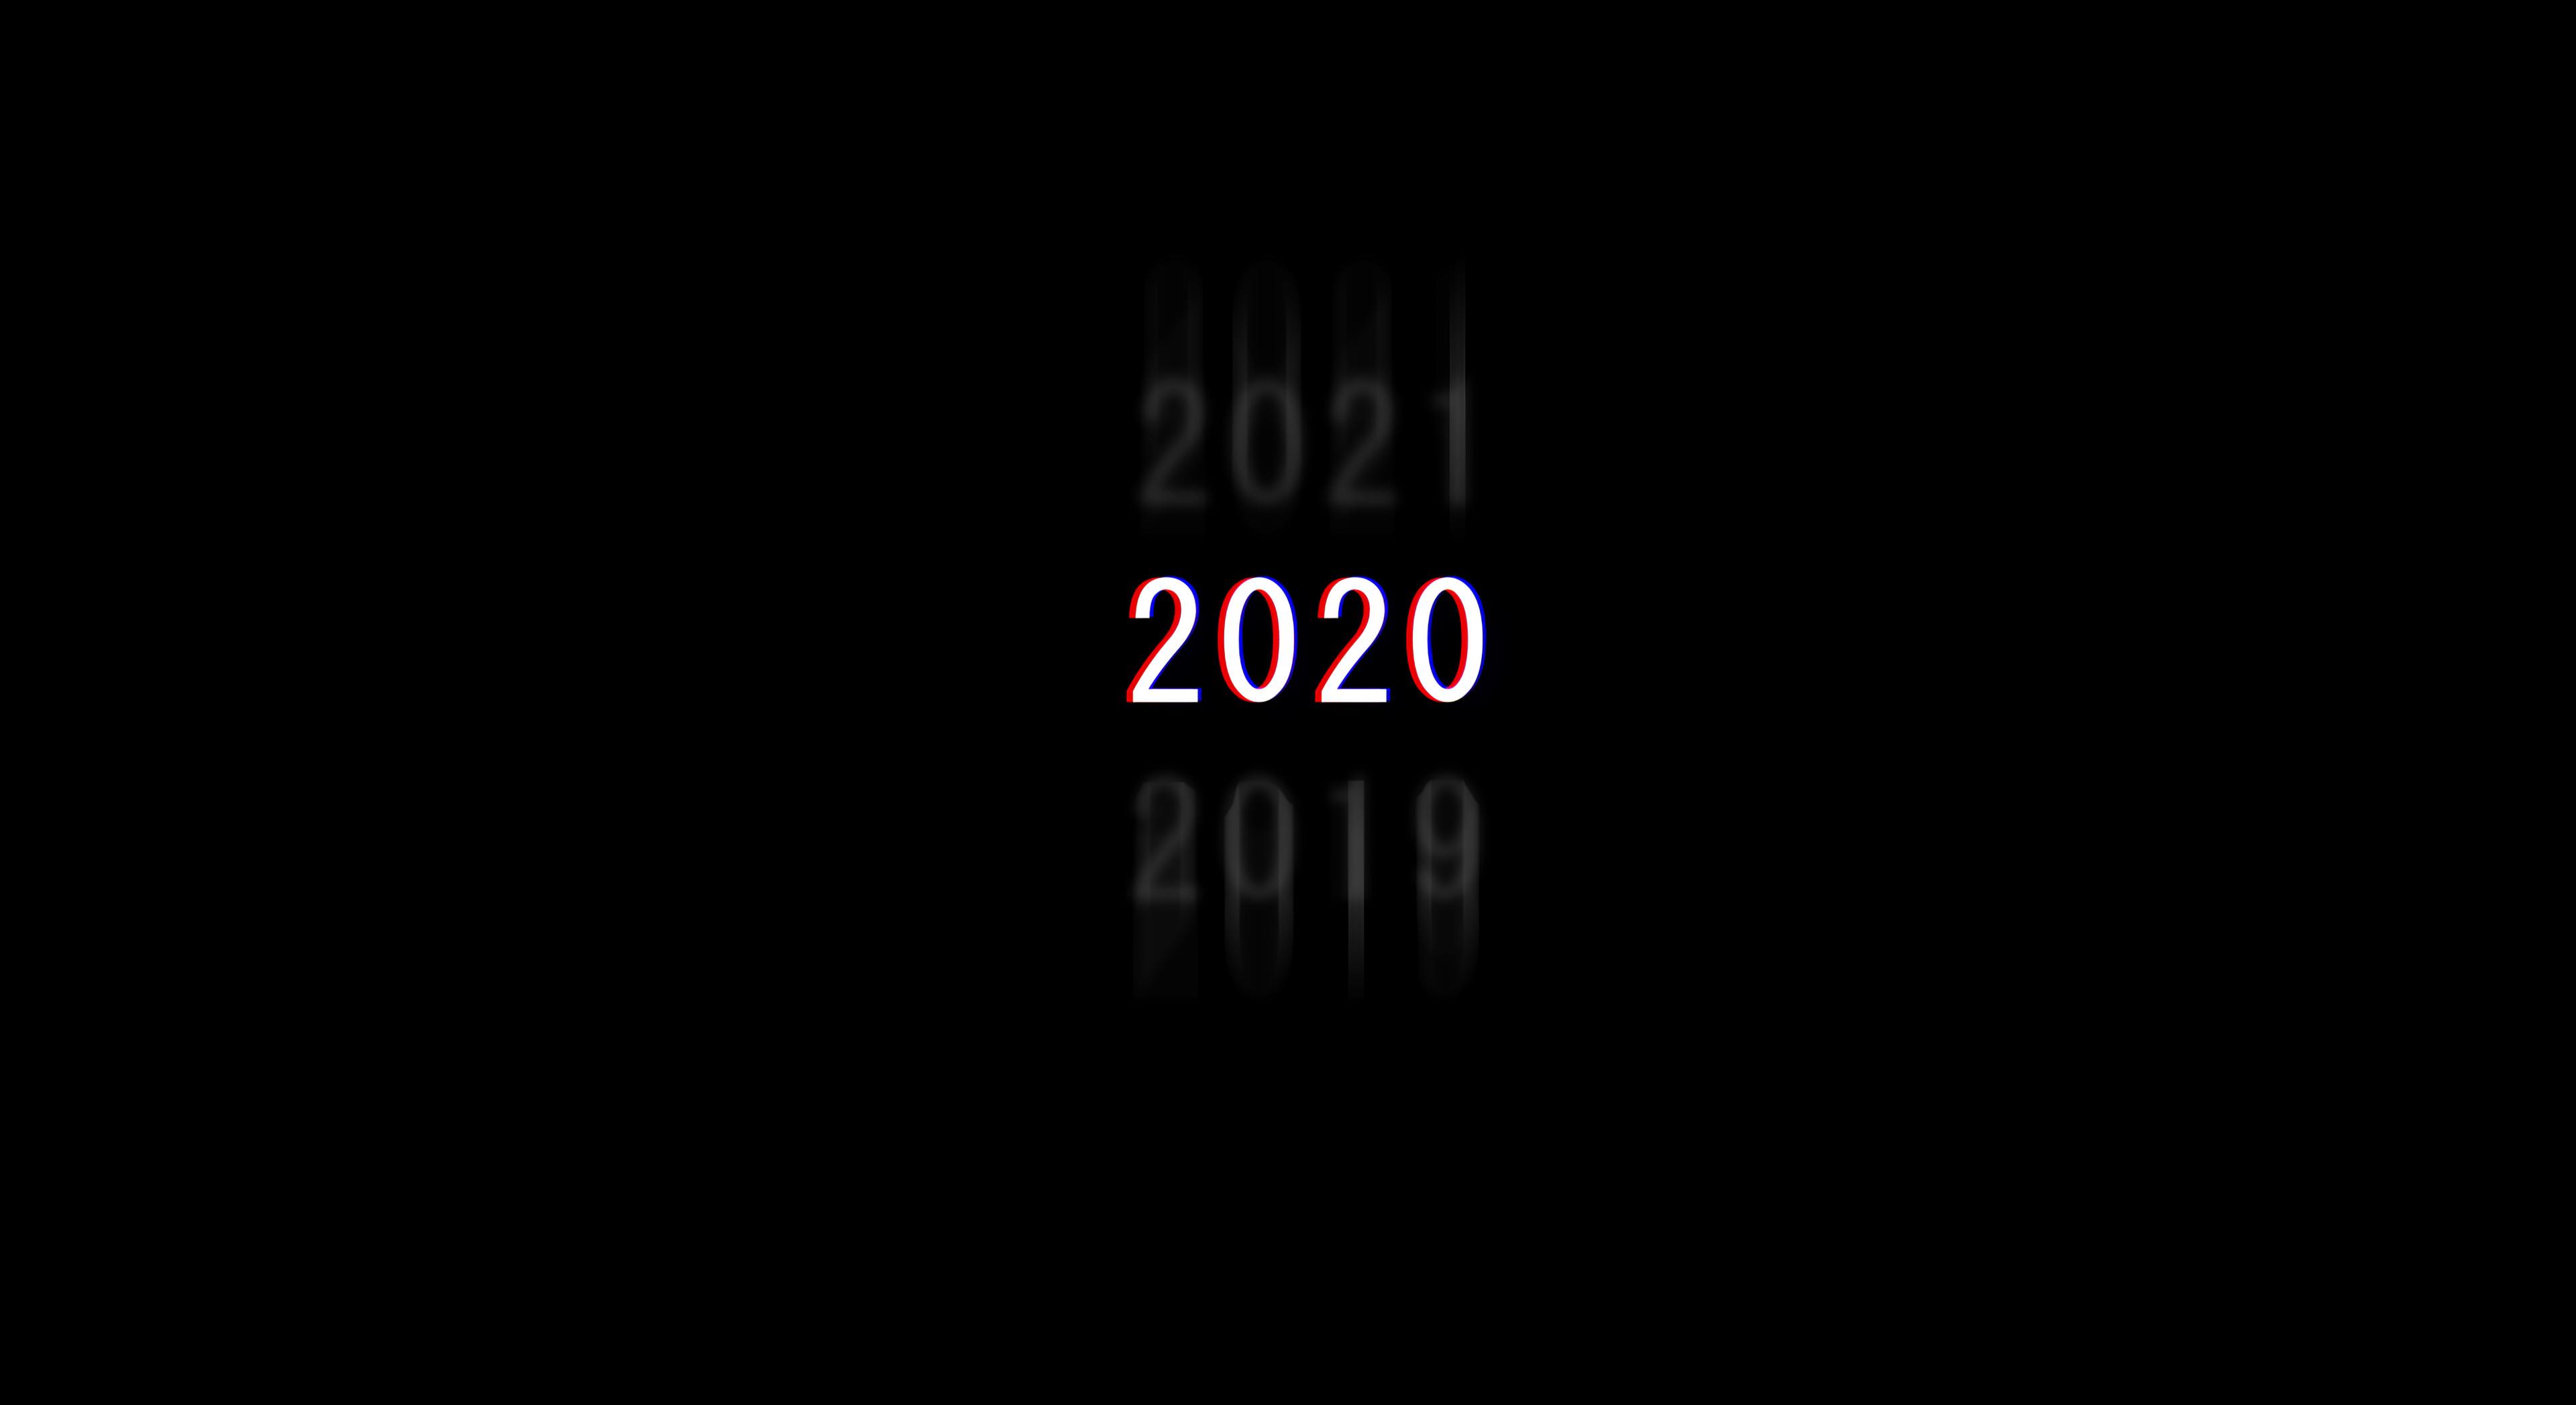 1600x900 2020 Dark Minimal New Year 4k 1600x900 Resolution Hd 4k